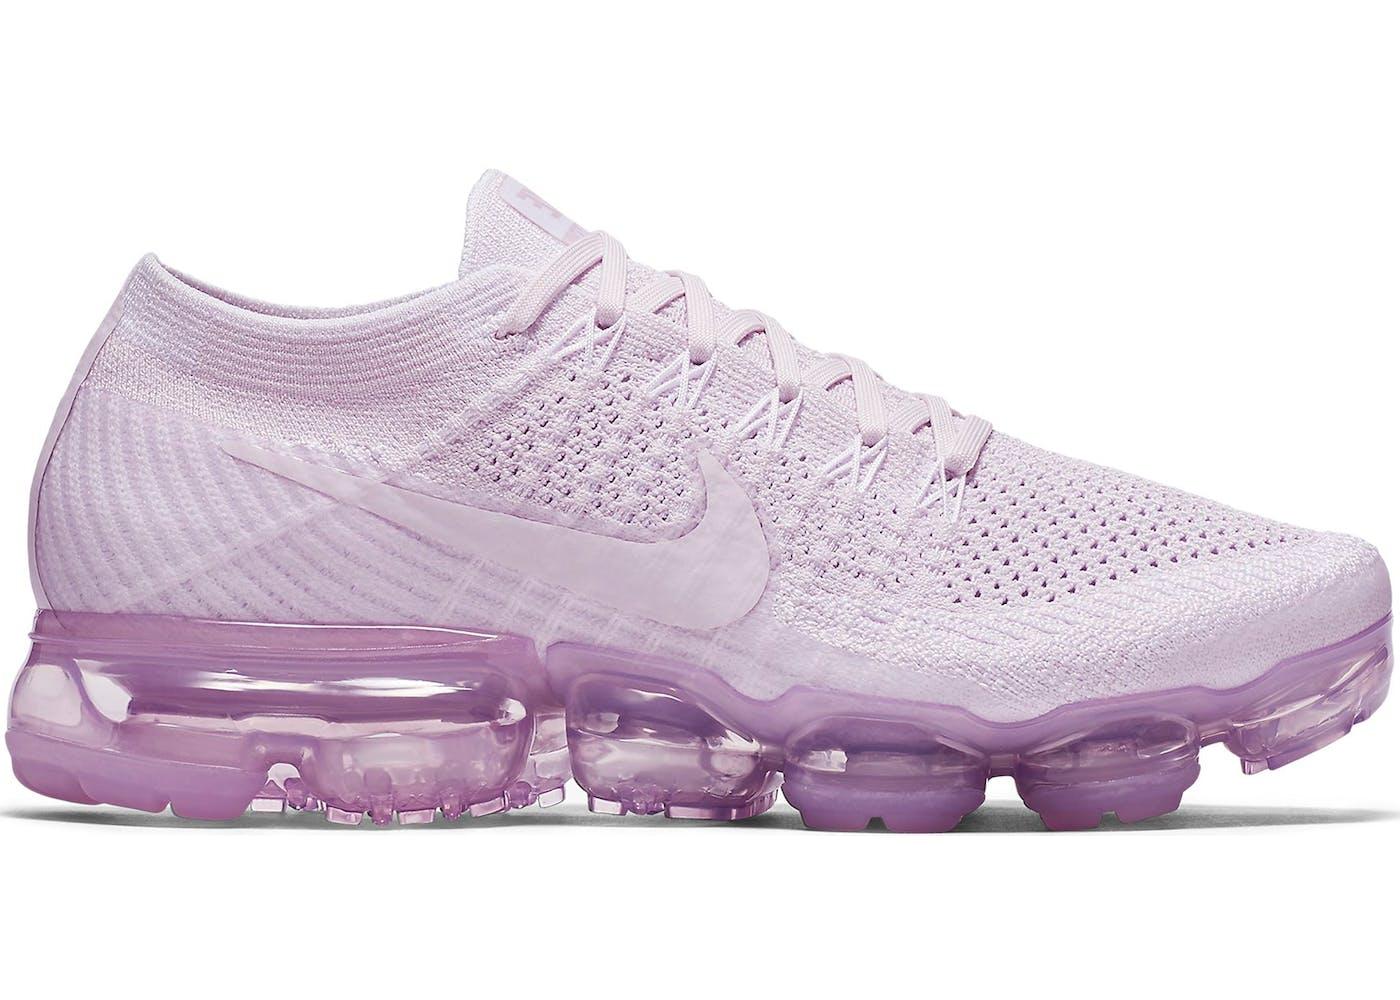 Nike Vapormax Violet